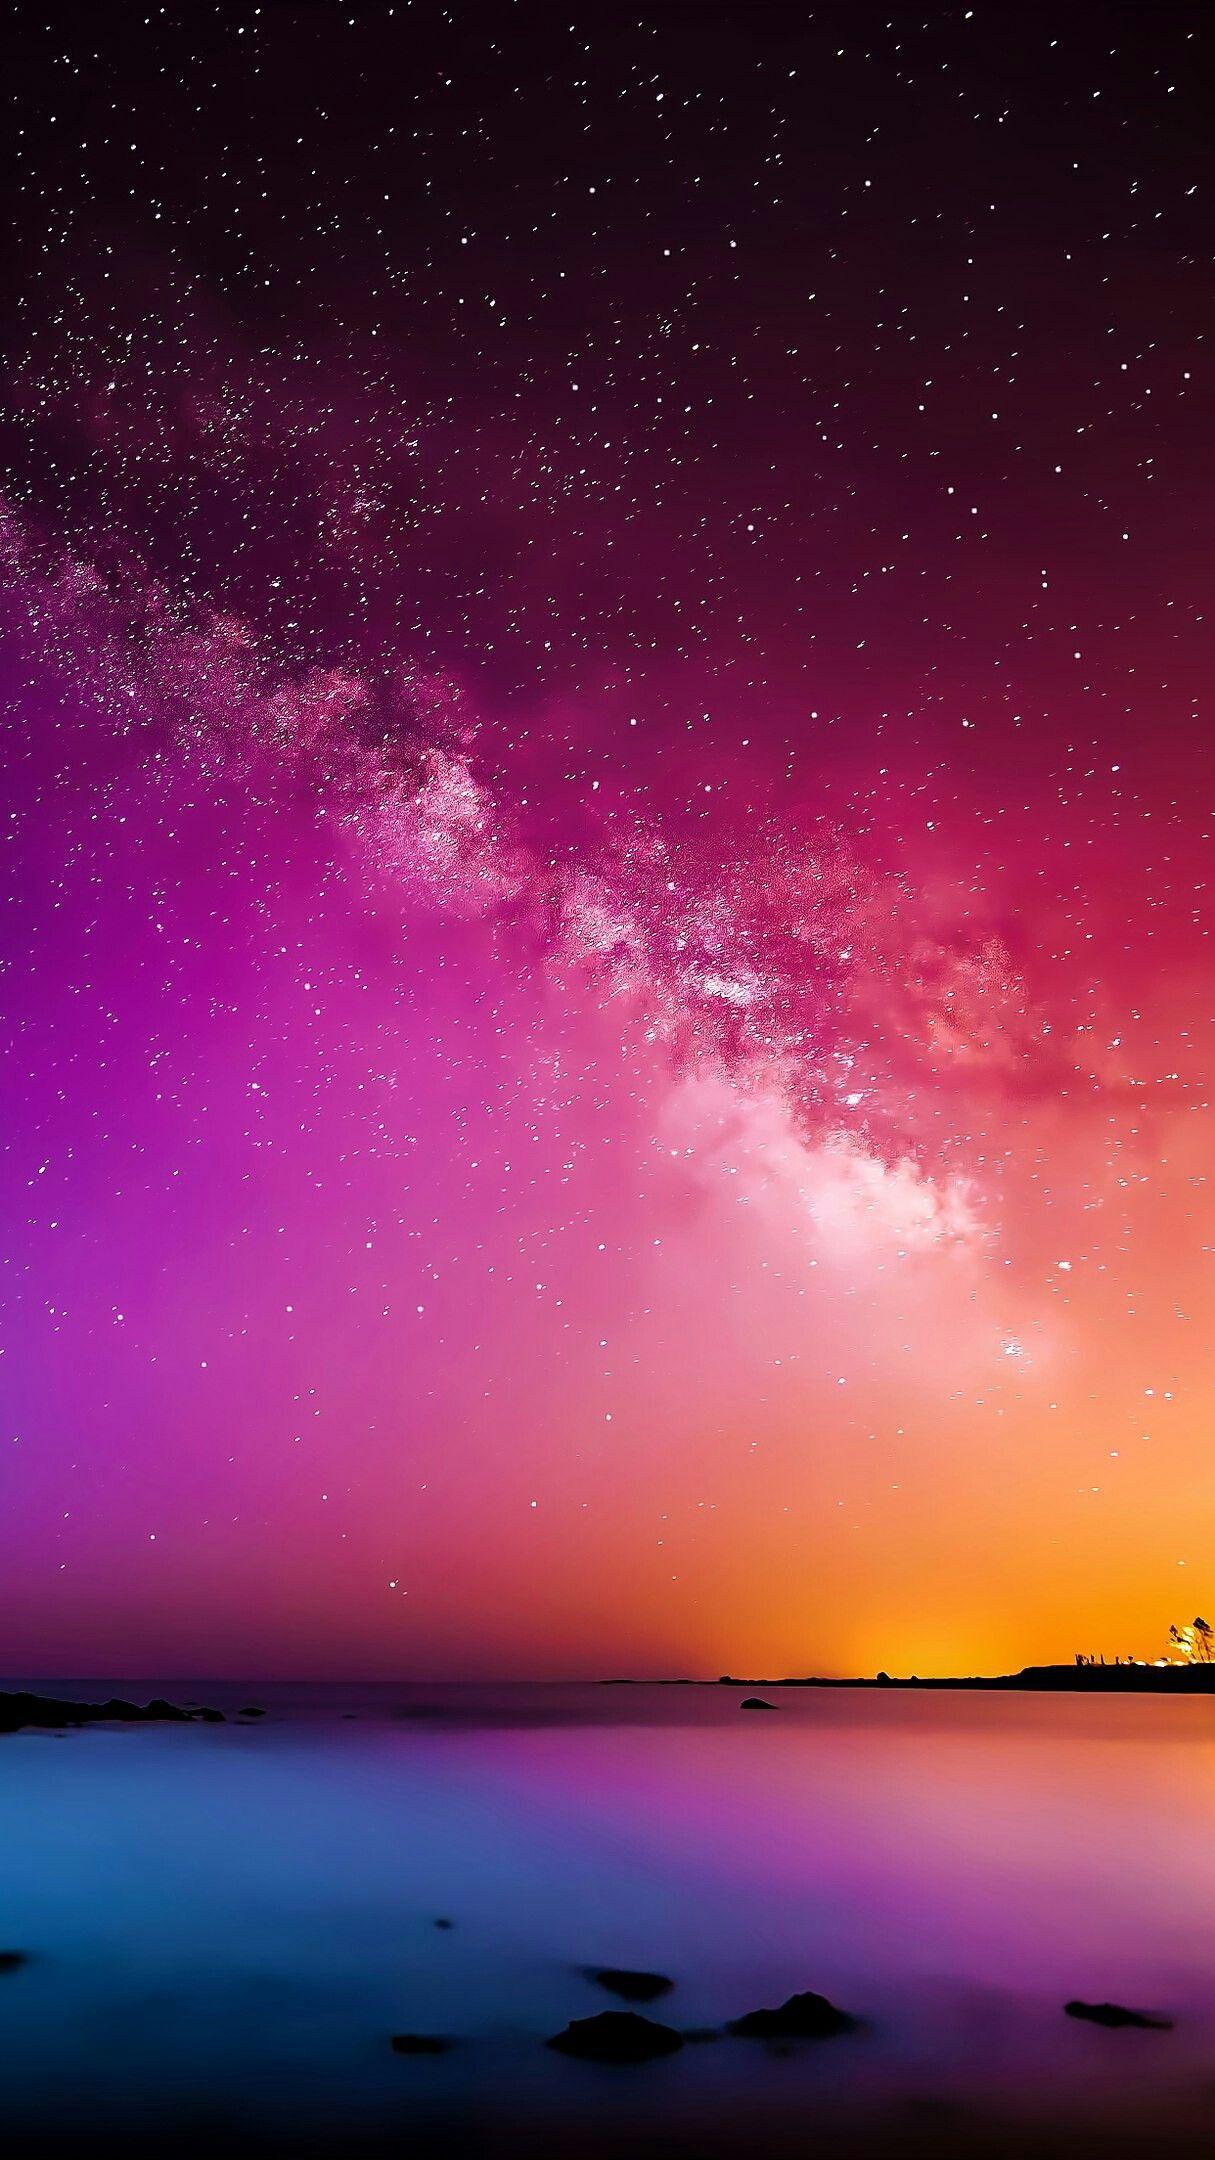 Amazing Wallpaper Night Colorful - e3ab227bcd8edd5dfdcea41941b93b41  Picture.jpg